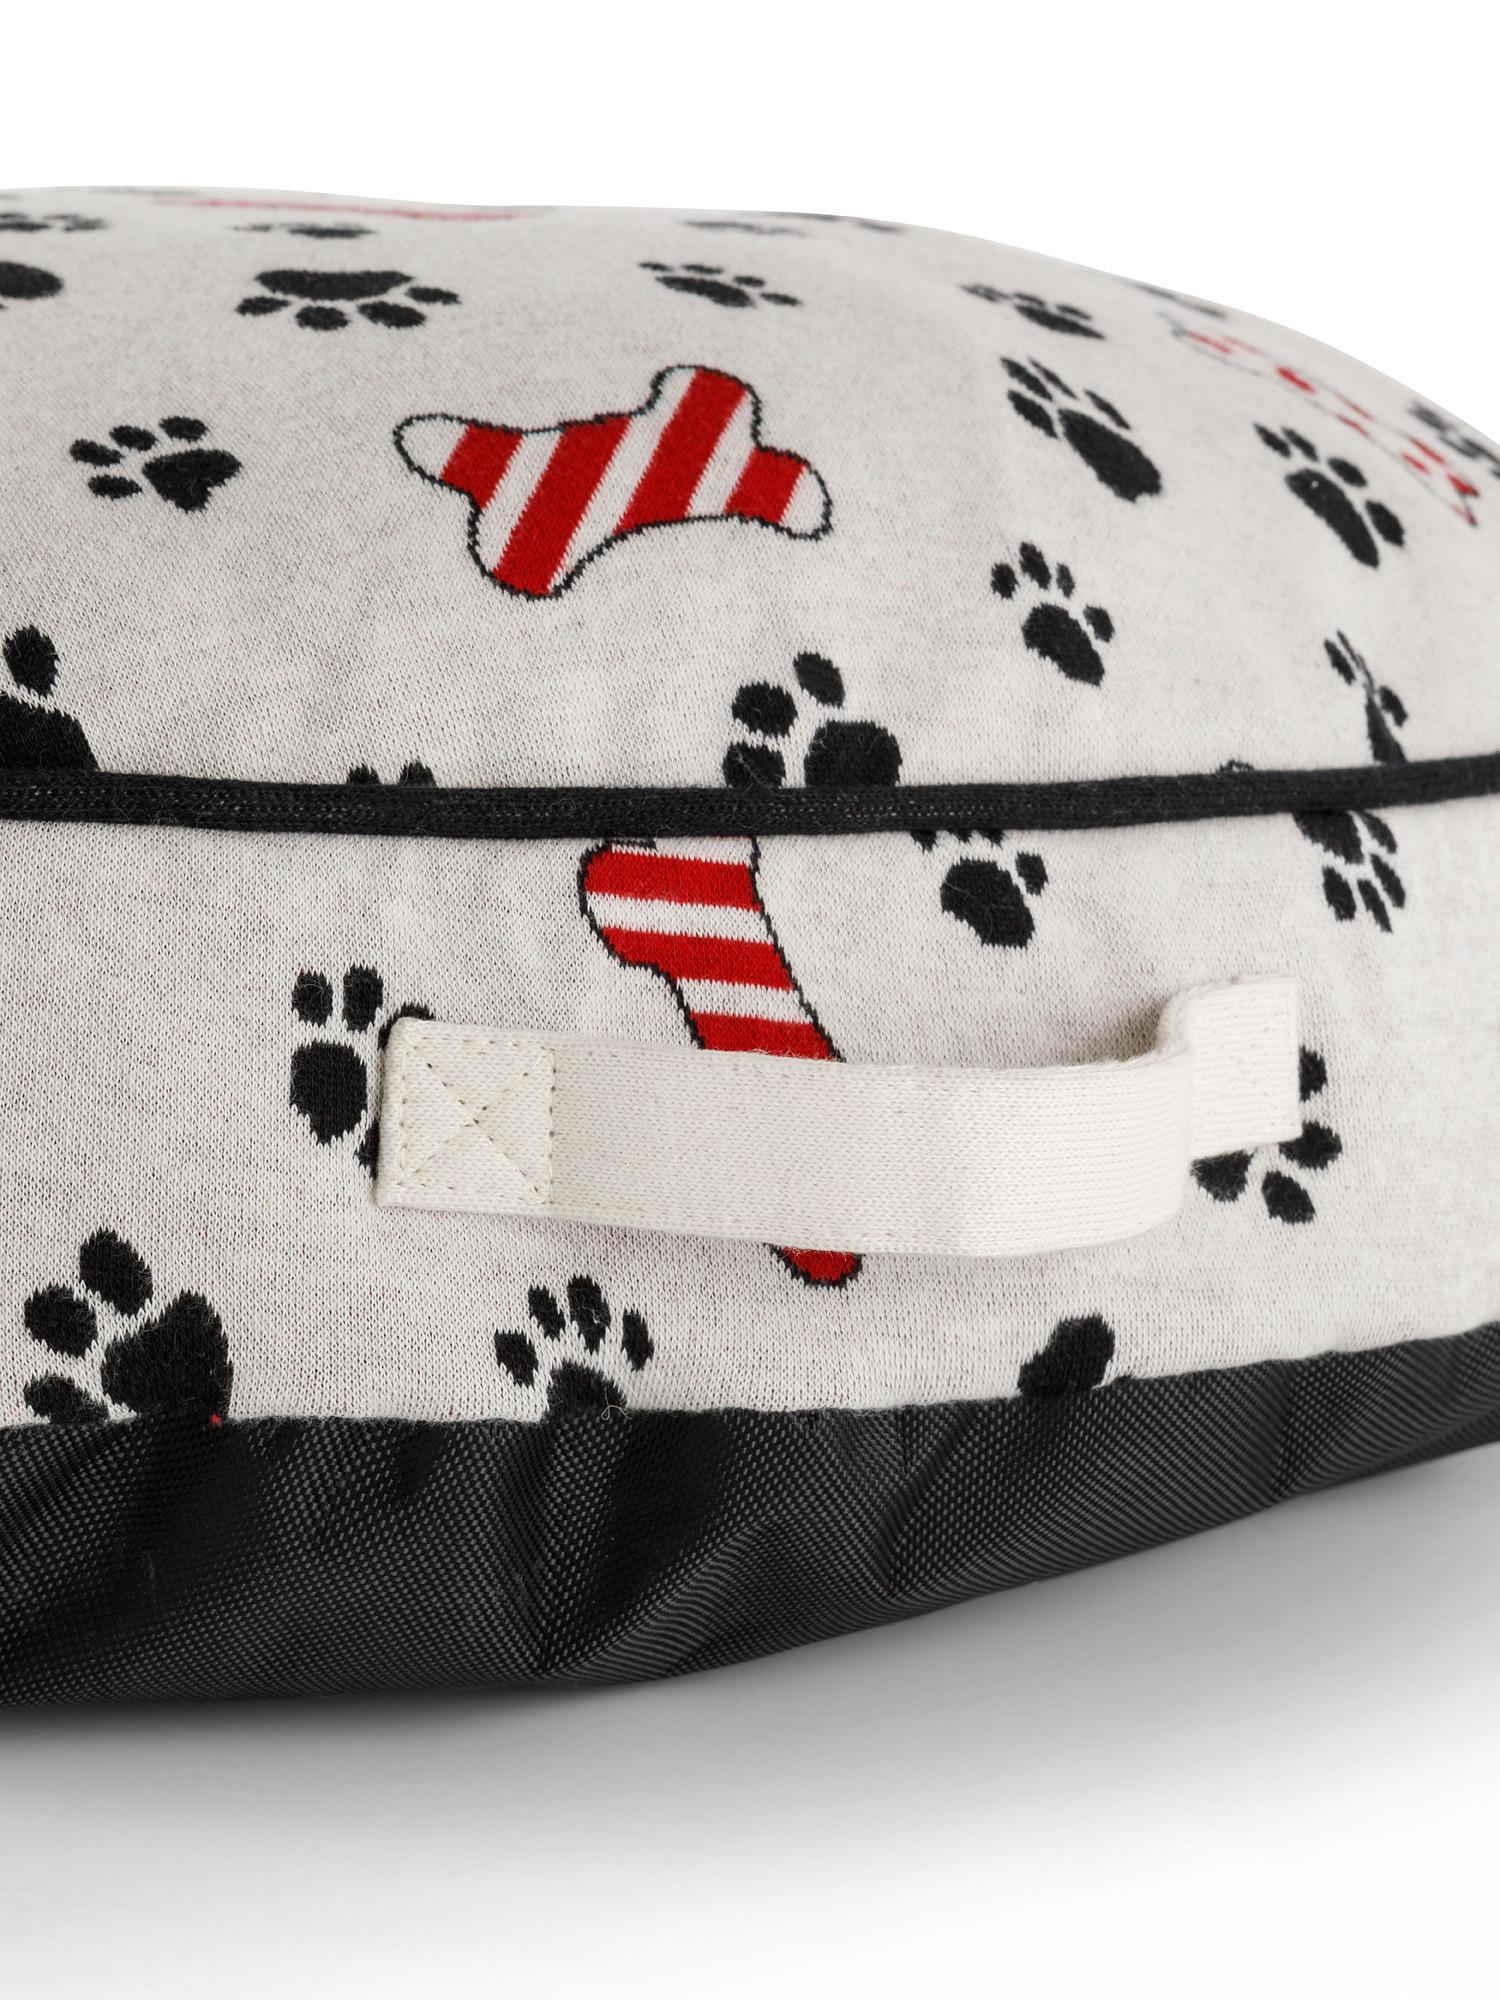 Cuscino cuccia motivo zampette, Beige chiaro, large image number 2